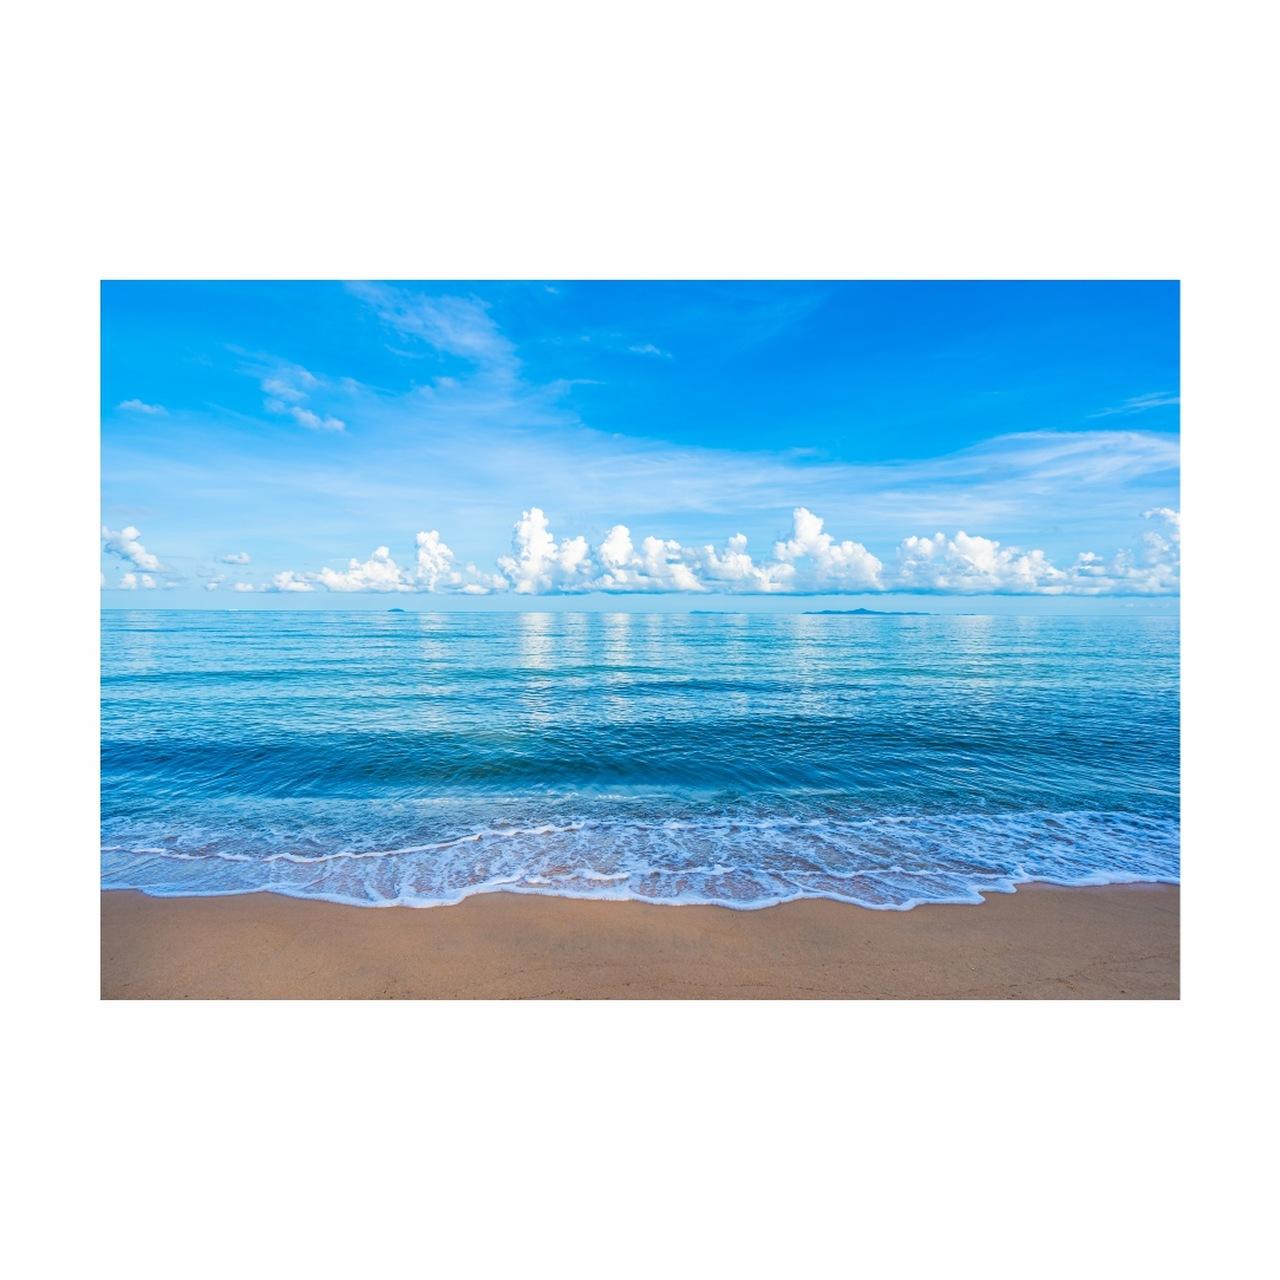 Quadro Praia Mar - Tela Única